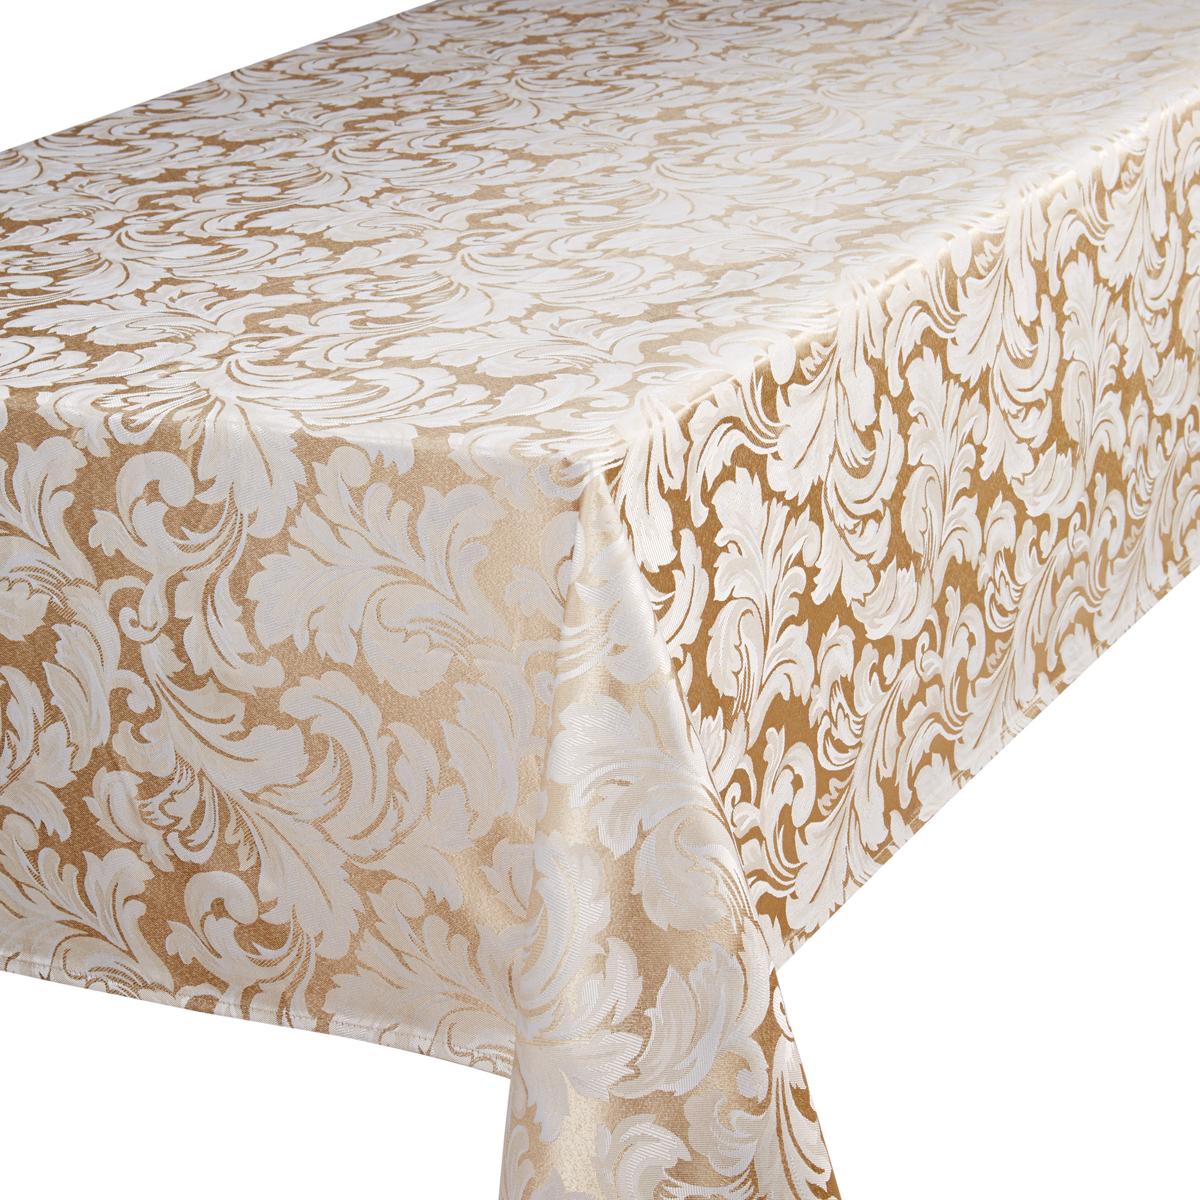 rideau luxe nappe jacquard linge table serviette set table chemin toute taille ebay. Black Bedroom Furniture Sets. Home Design Ideas